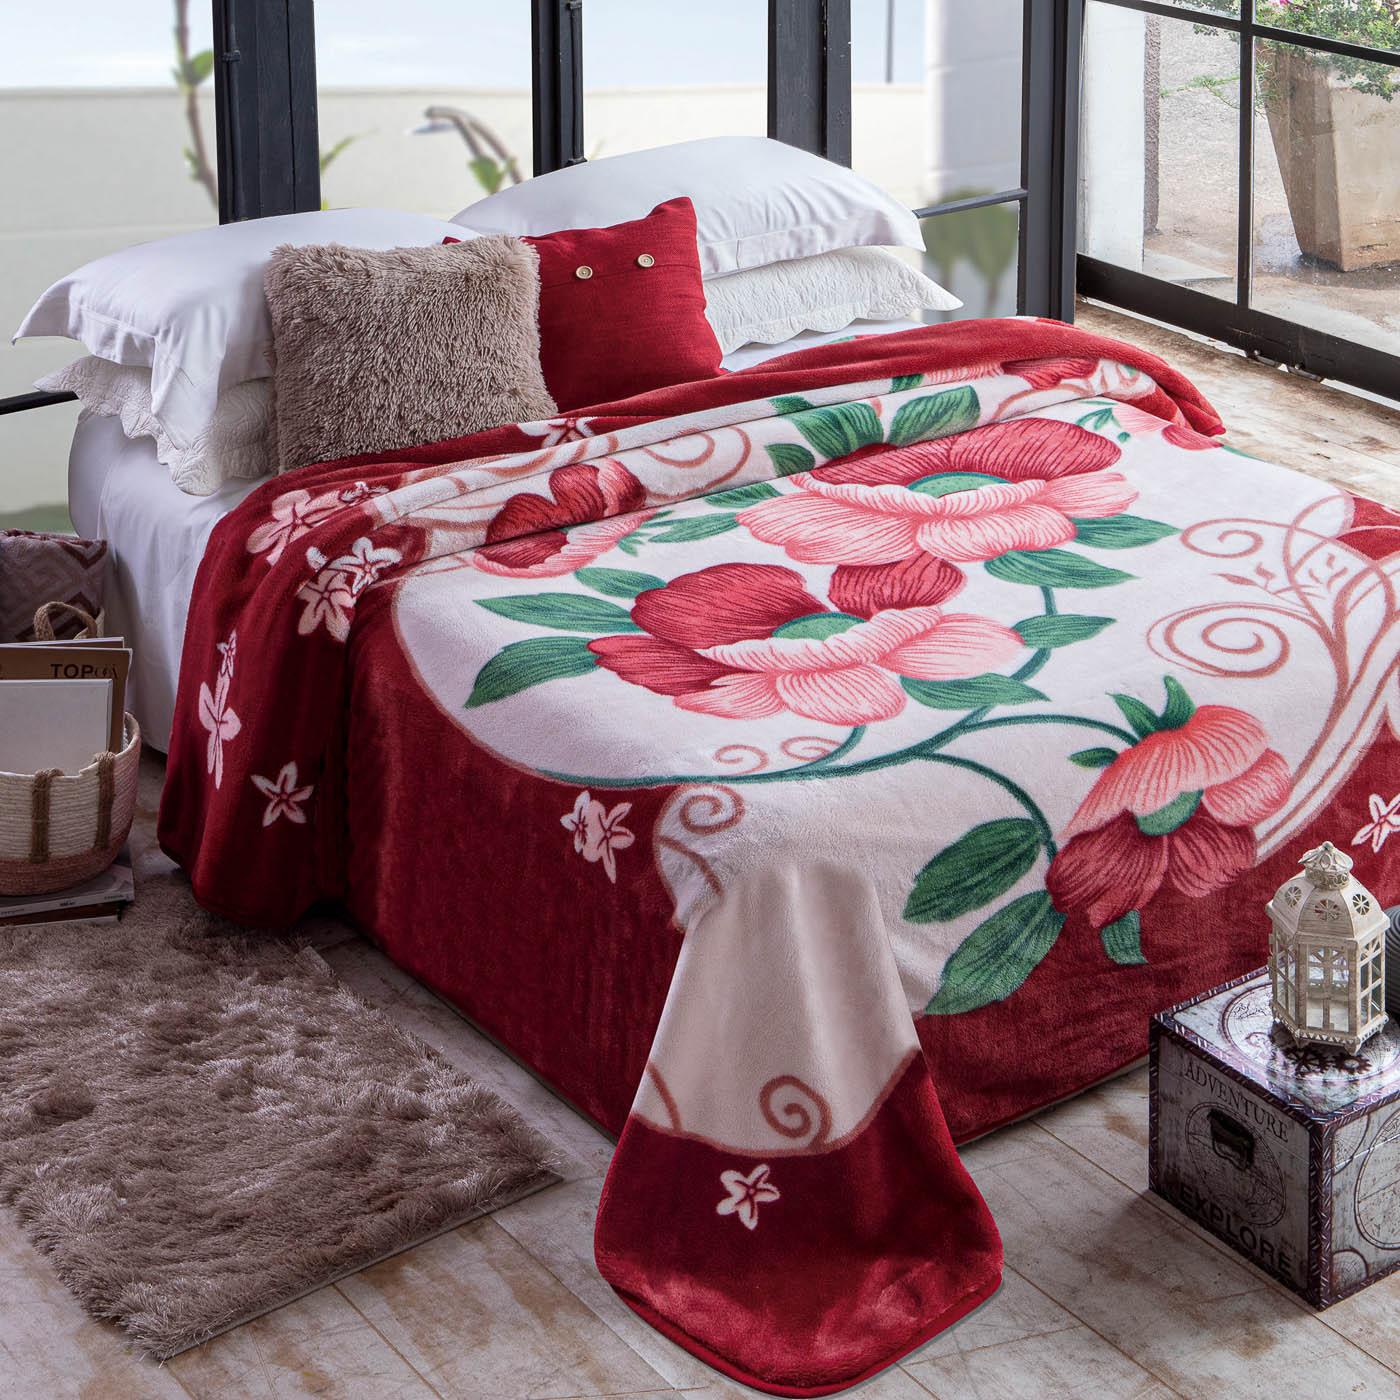 Cobertor Jolitex Casal Kyor Plus 1,80x2,20m Atlanta Vinho